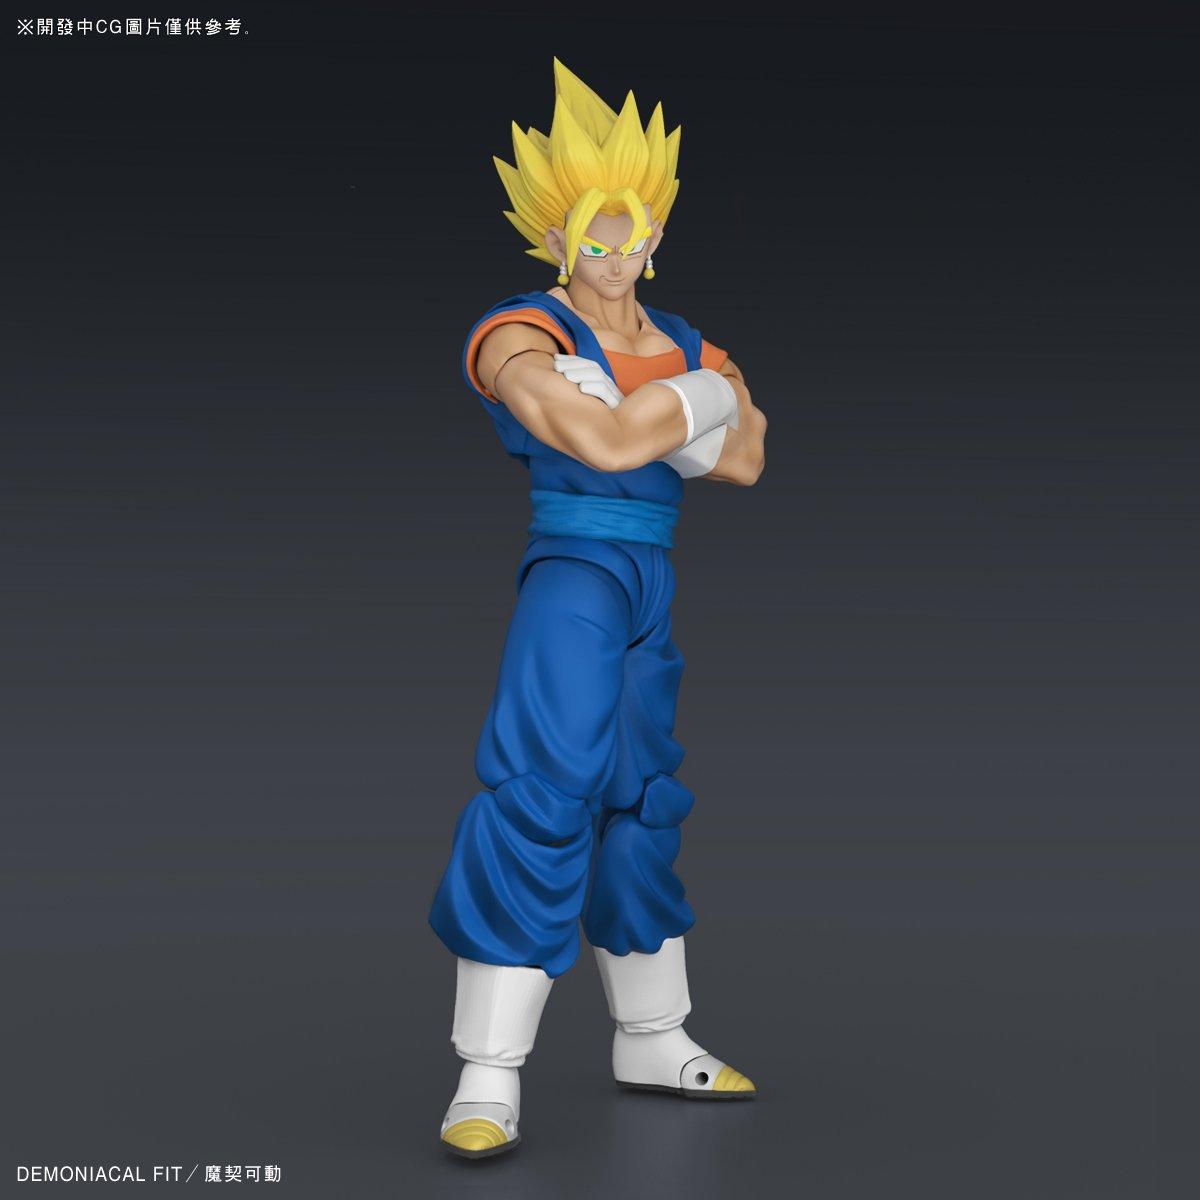 Demoniacal Fit Dragon Ball Z DBZ Custom headsculpt set per SHF Gugeta Anime